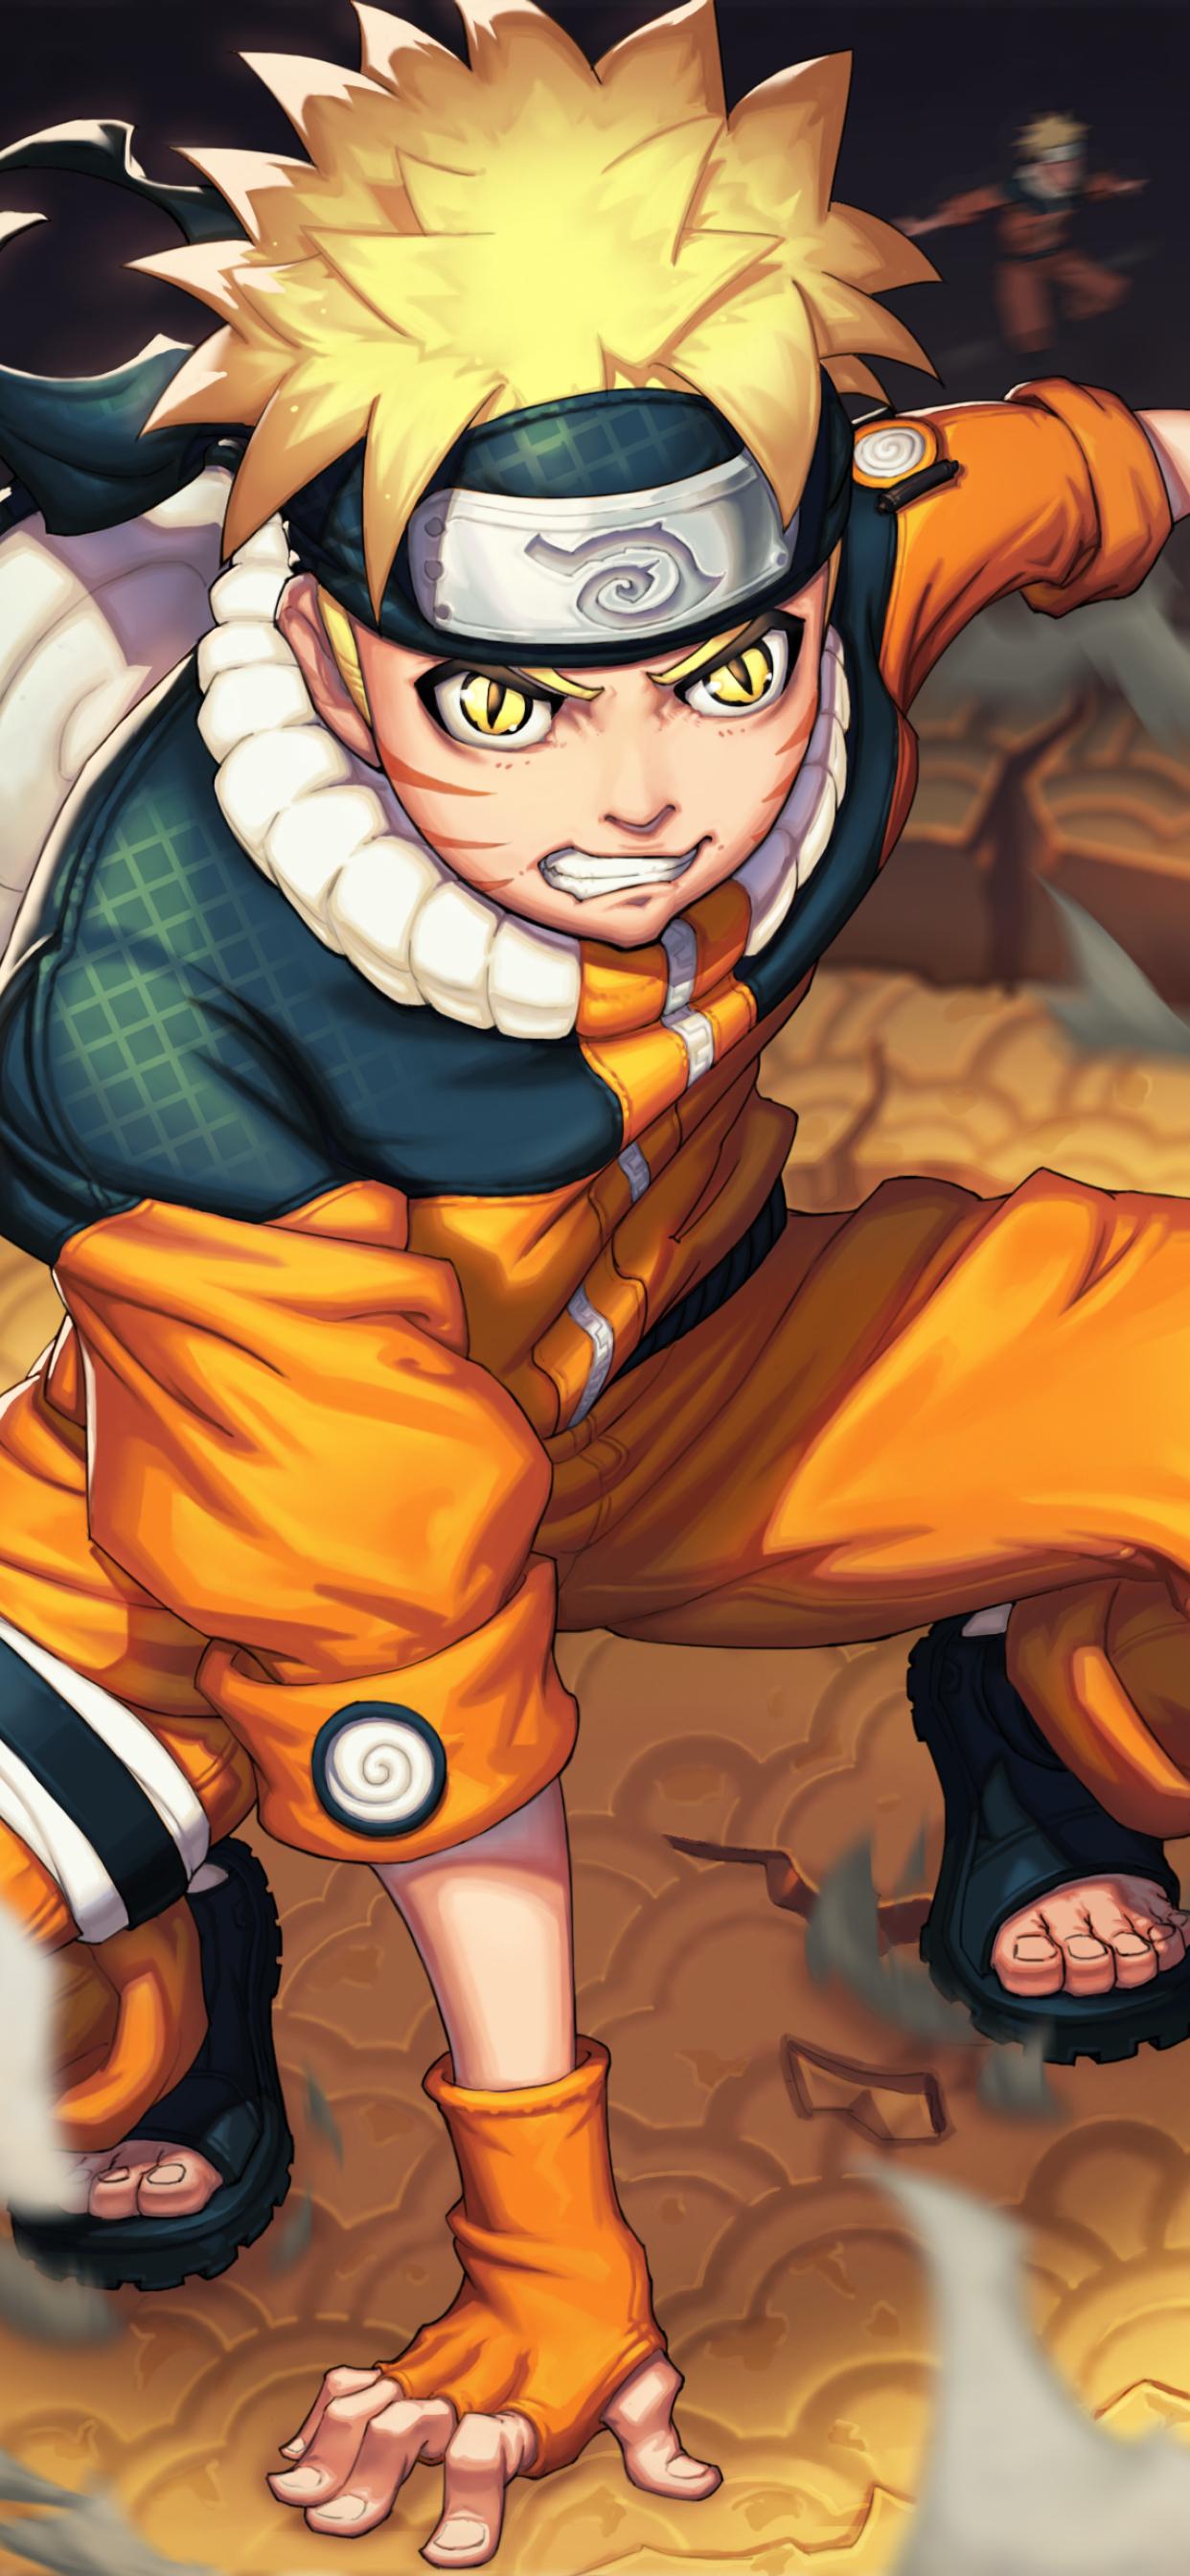 1242x2688 Naruto Uzumaki 4K Art Iphone XS MAX Wallpaper ...